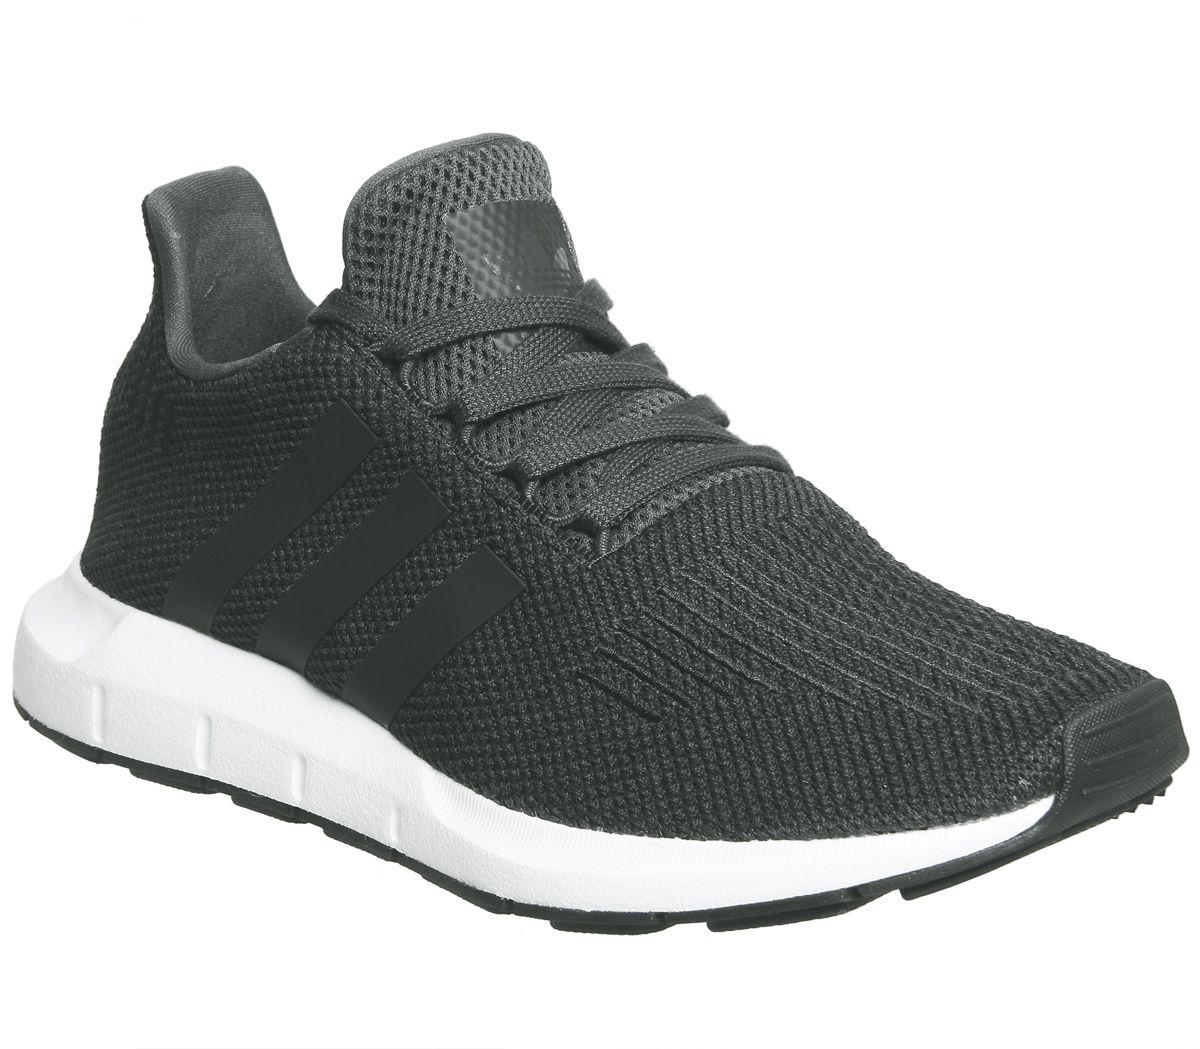 d608a794c adidas Swift Run Trainers Carbon - Unisex Sports